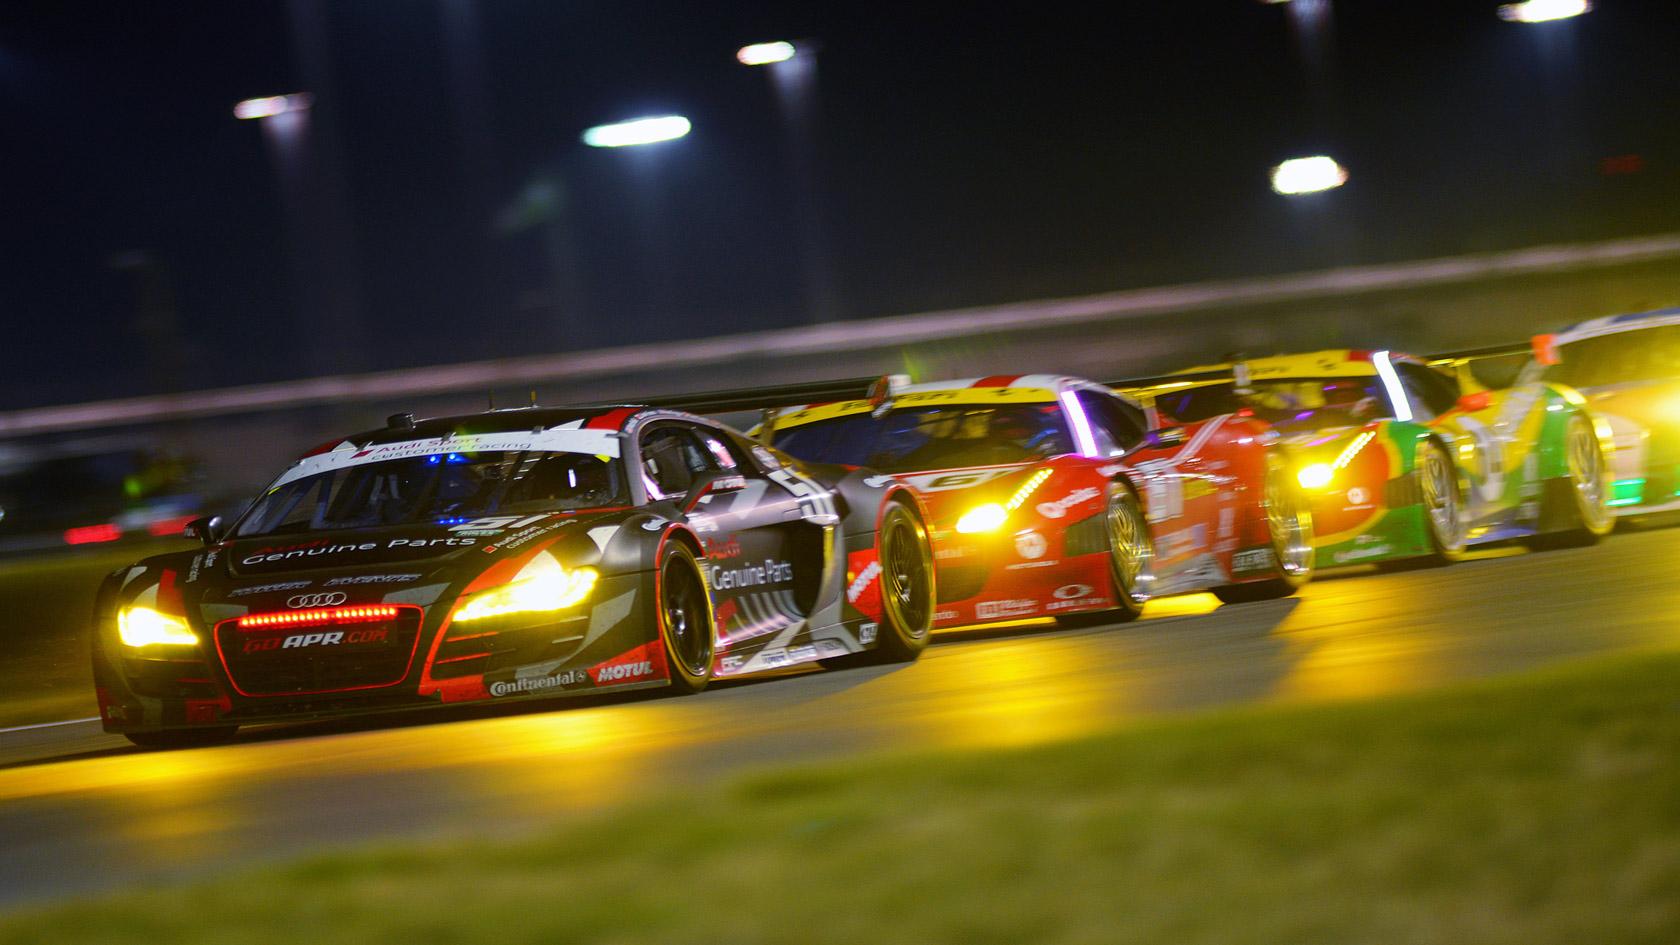 Wallpaper Wednesday Audi Racing Infinite Garage 1680x945